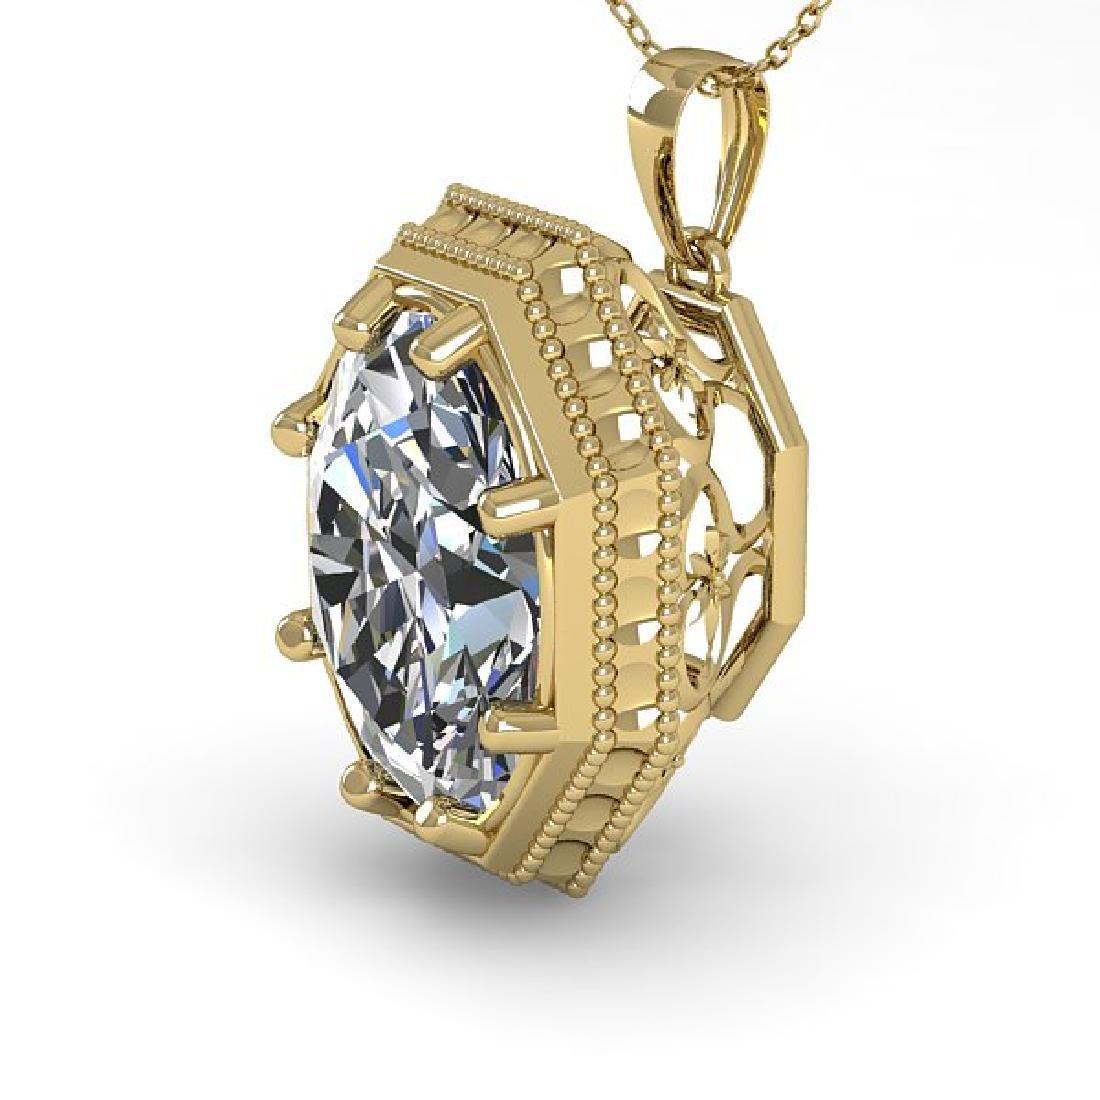 1 CTW VS/SI Oval Cut Diamond Solitaire Necklace 14K